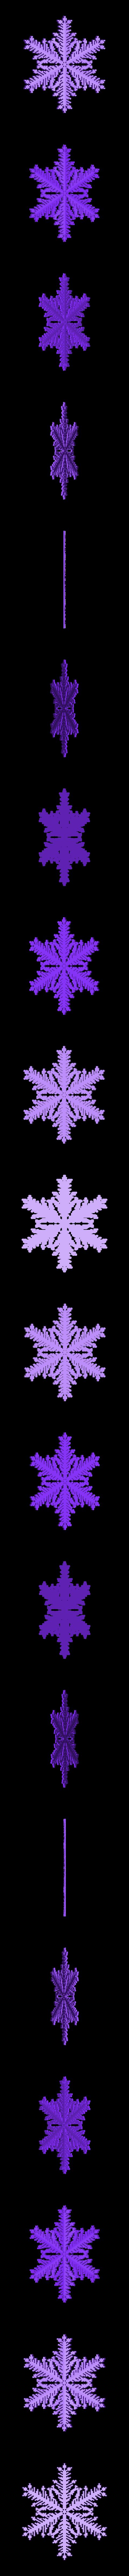 r40-rg6.stl Download free STL file Snowflake growth simulation in BlocksCAD • 3D printing design, arpruss